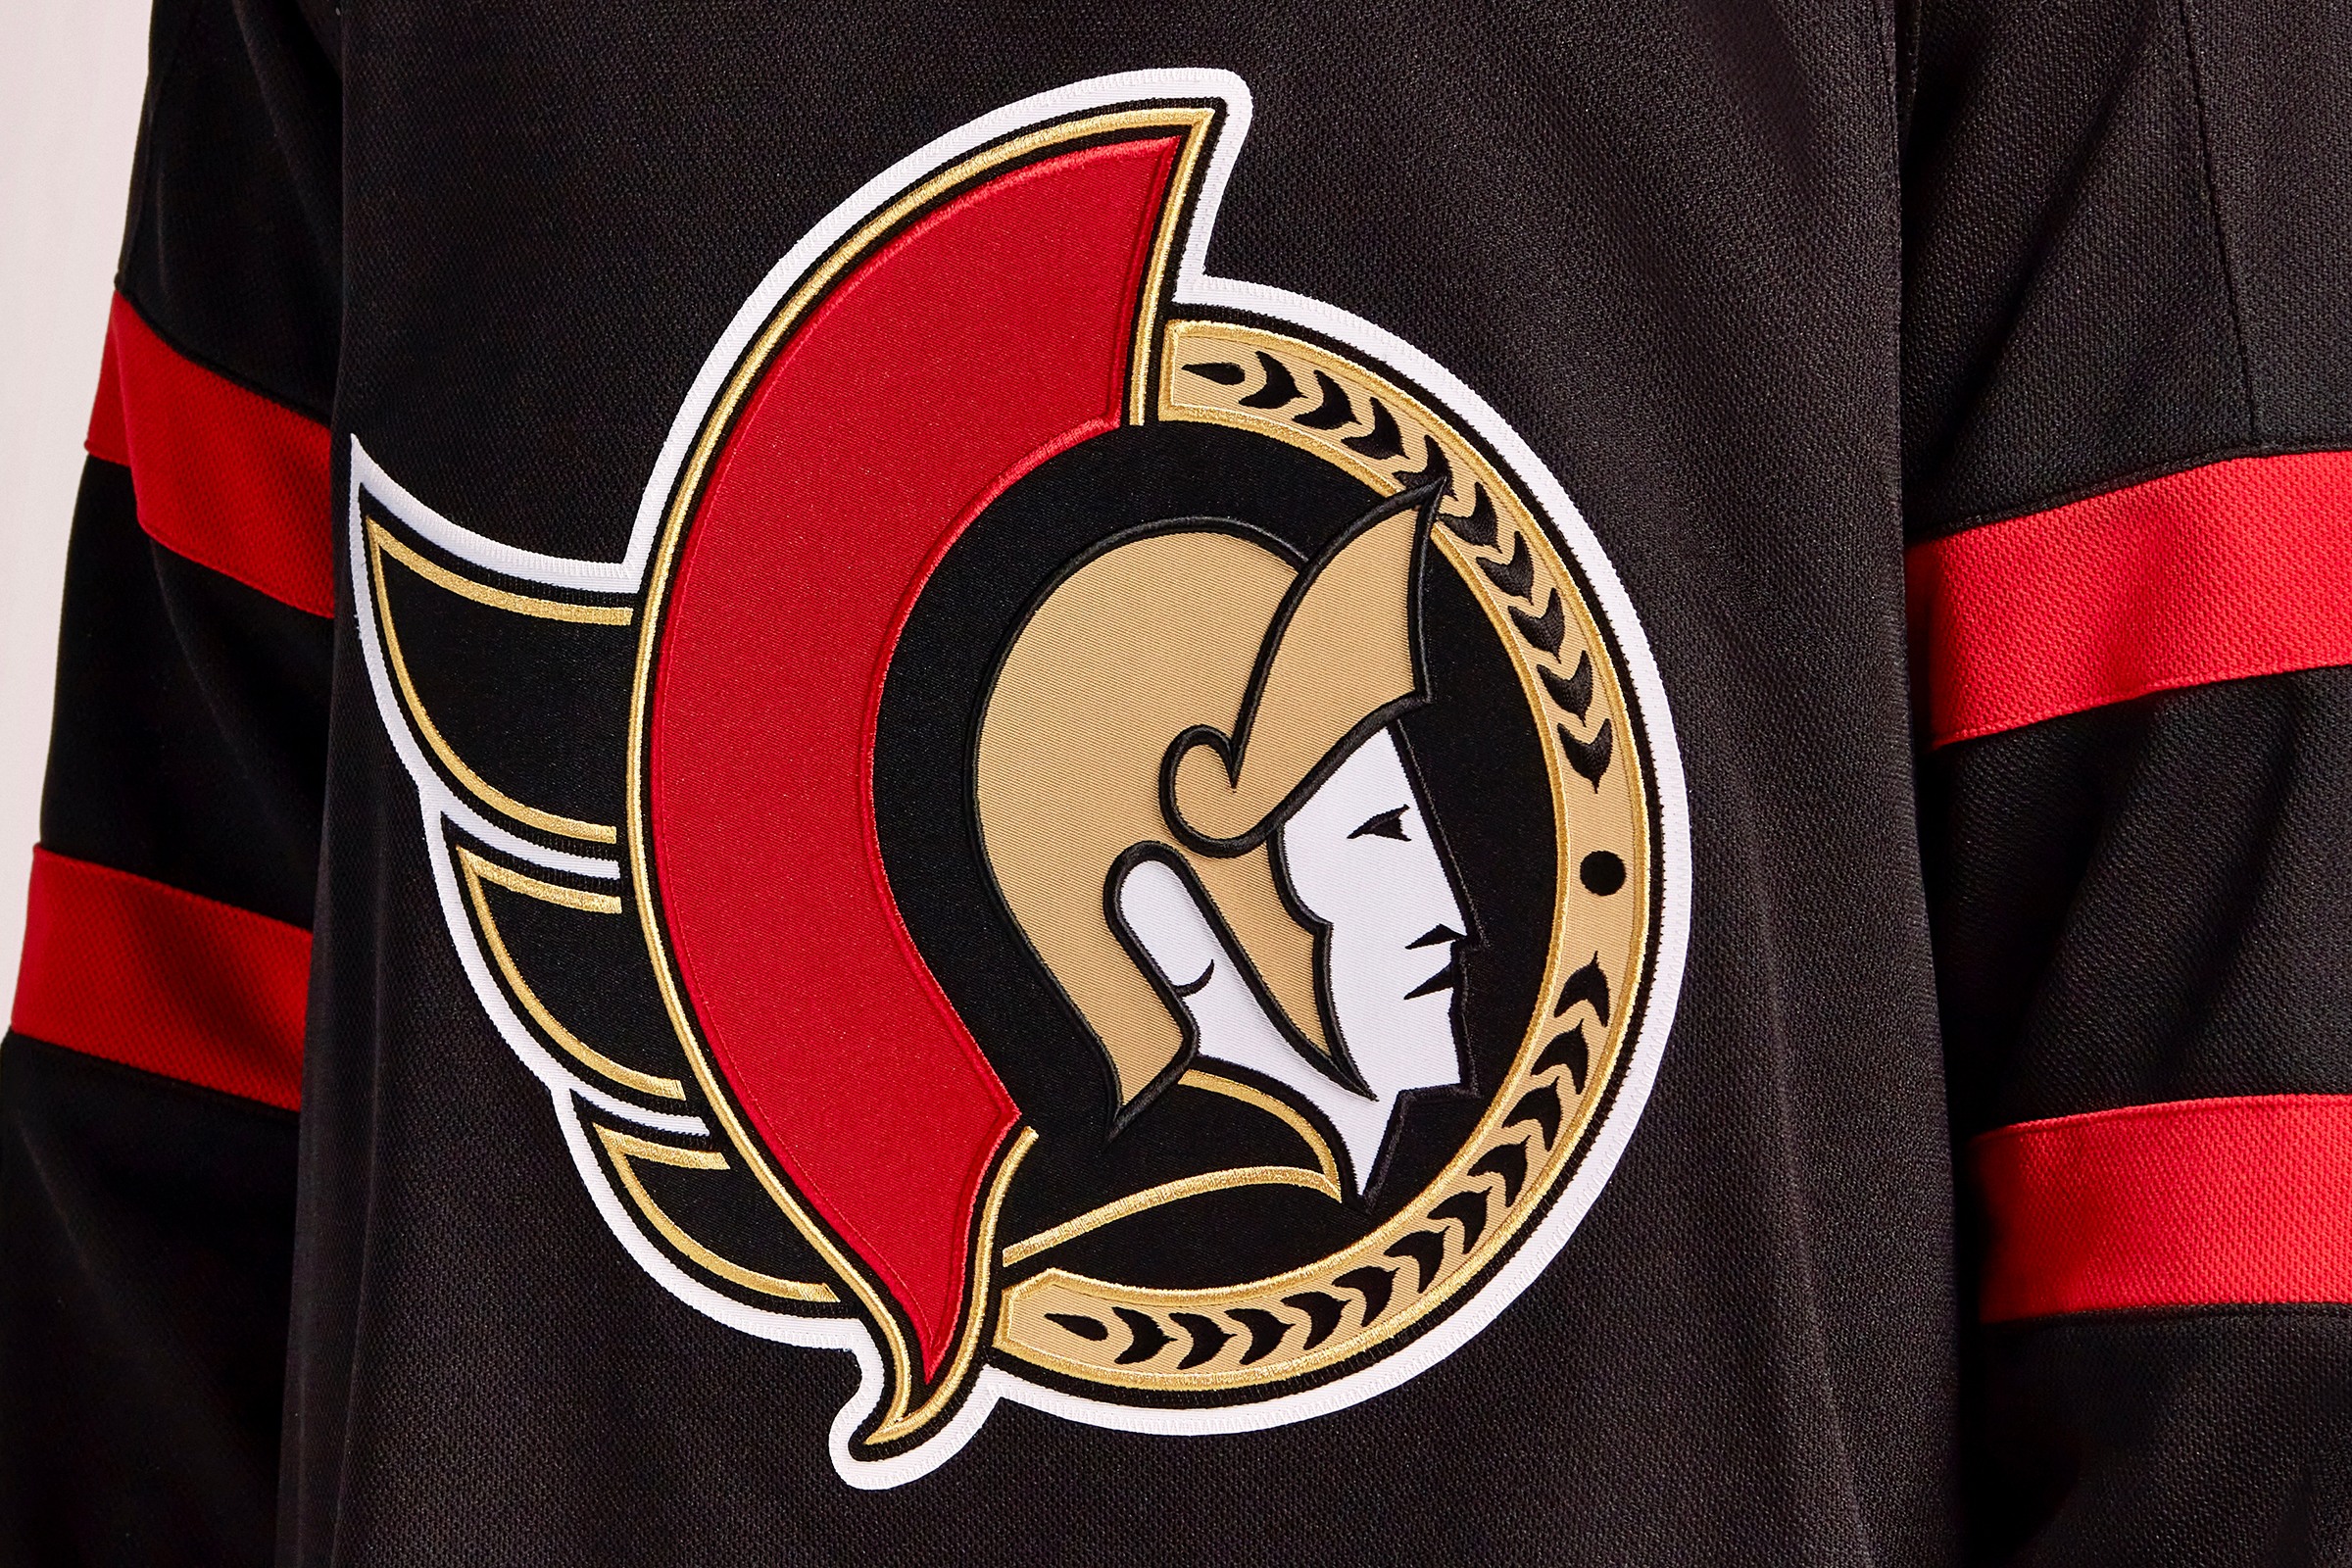 The Senators' new jersey.